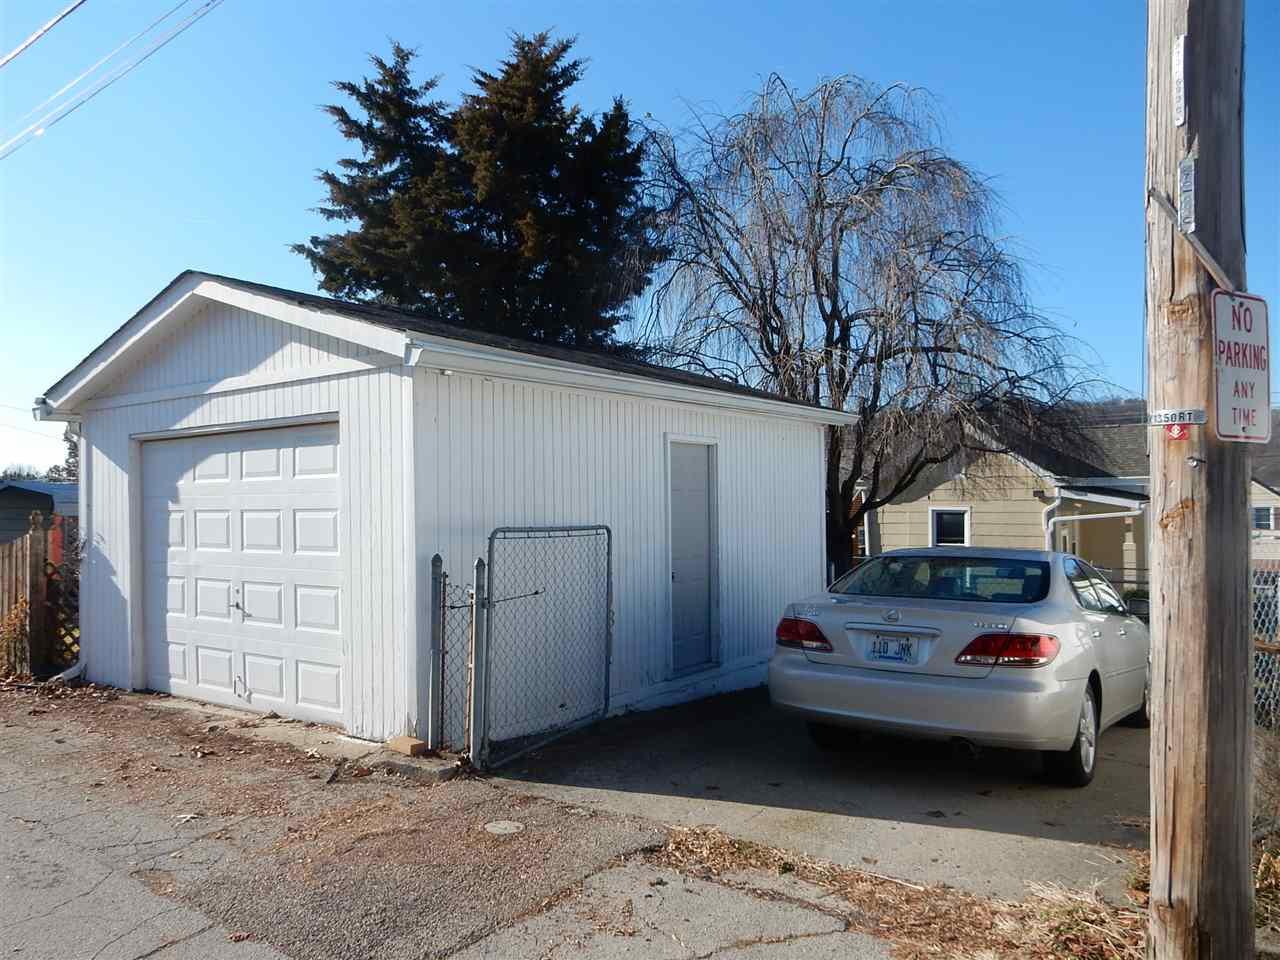 Photo 2 for 607 Oak Ludlow, KY 41016